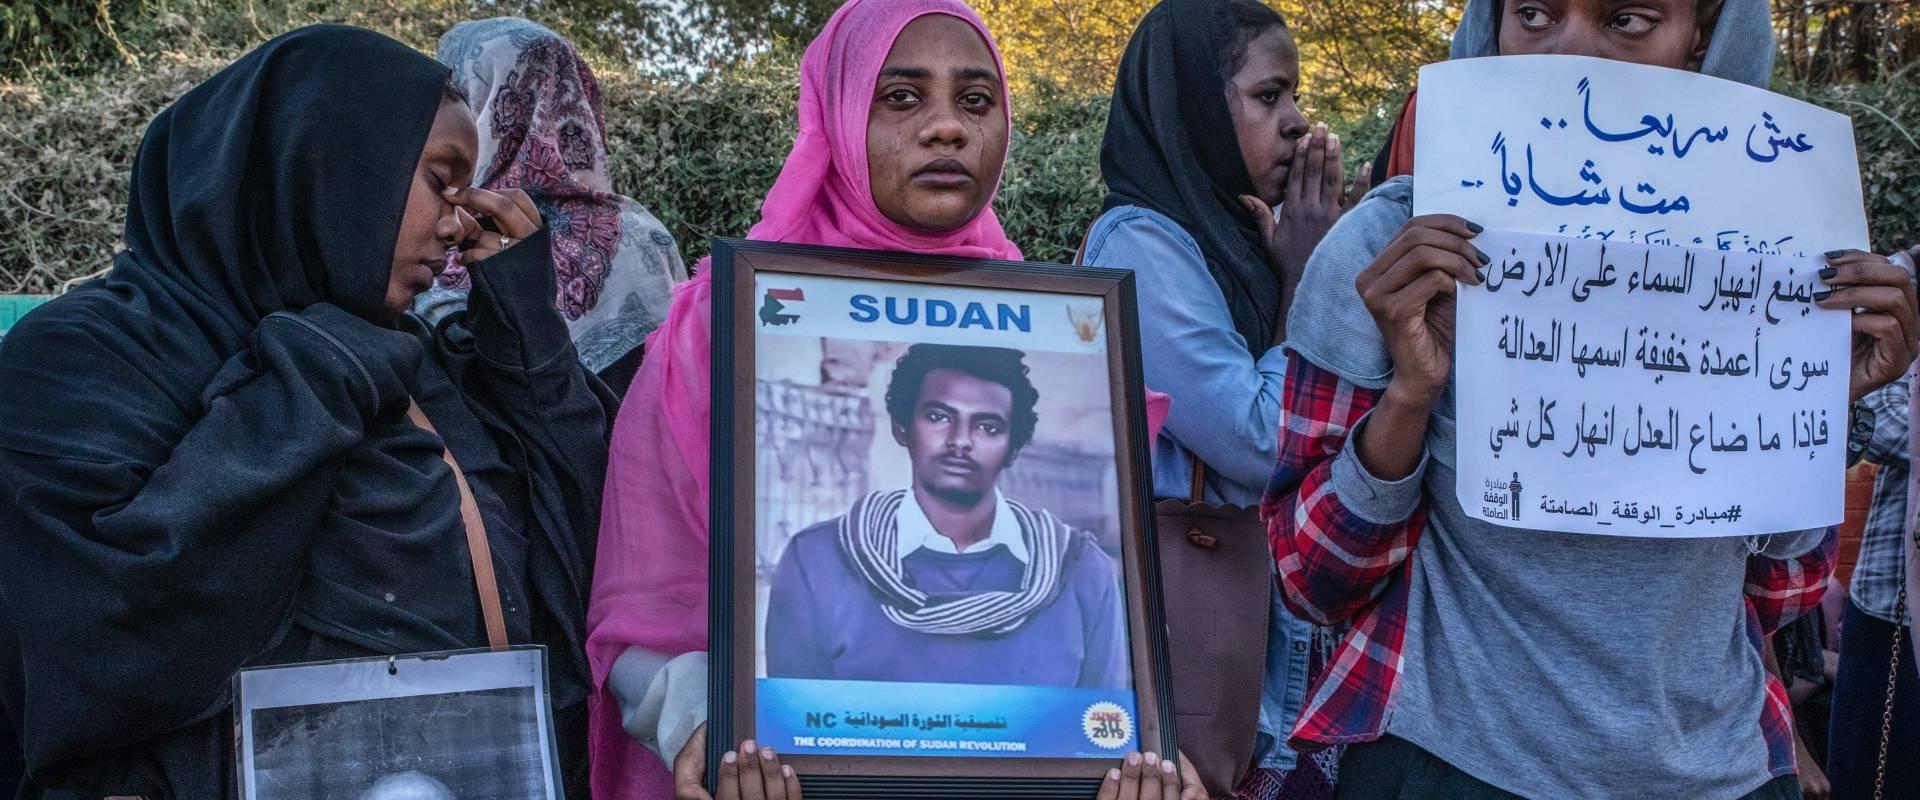 Sudan's Unfinished Revolution